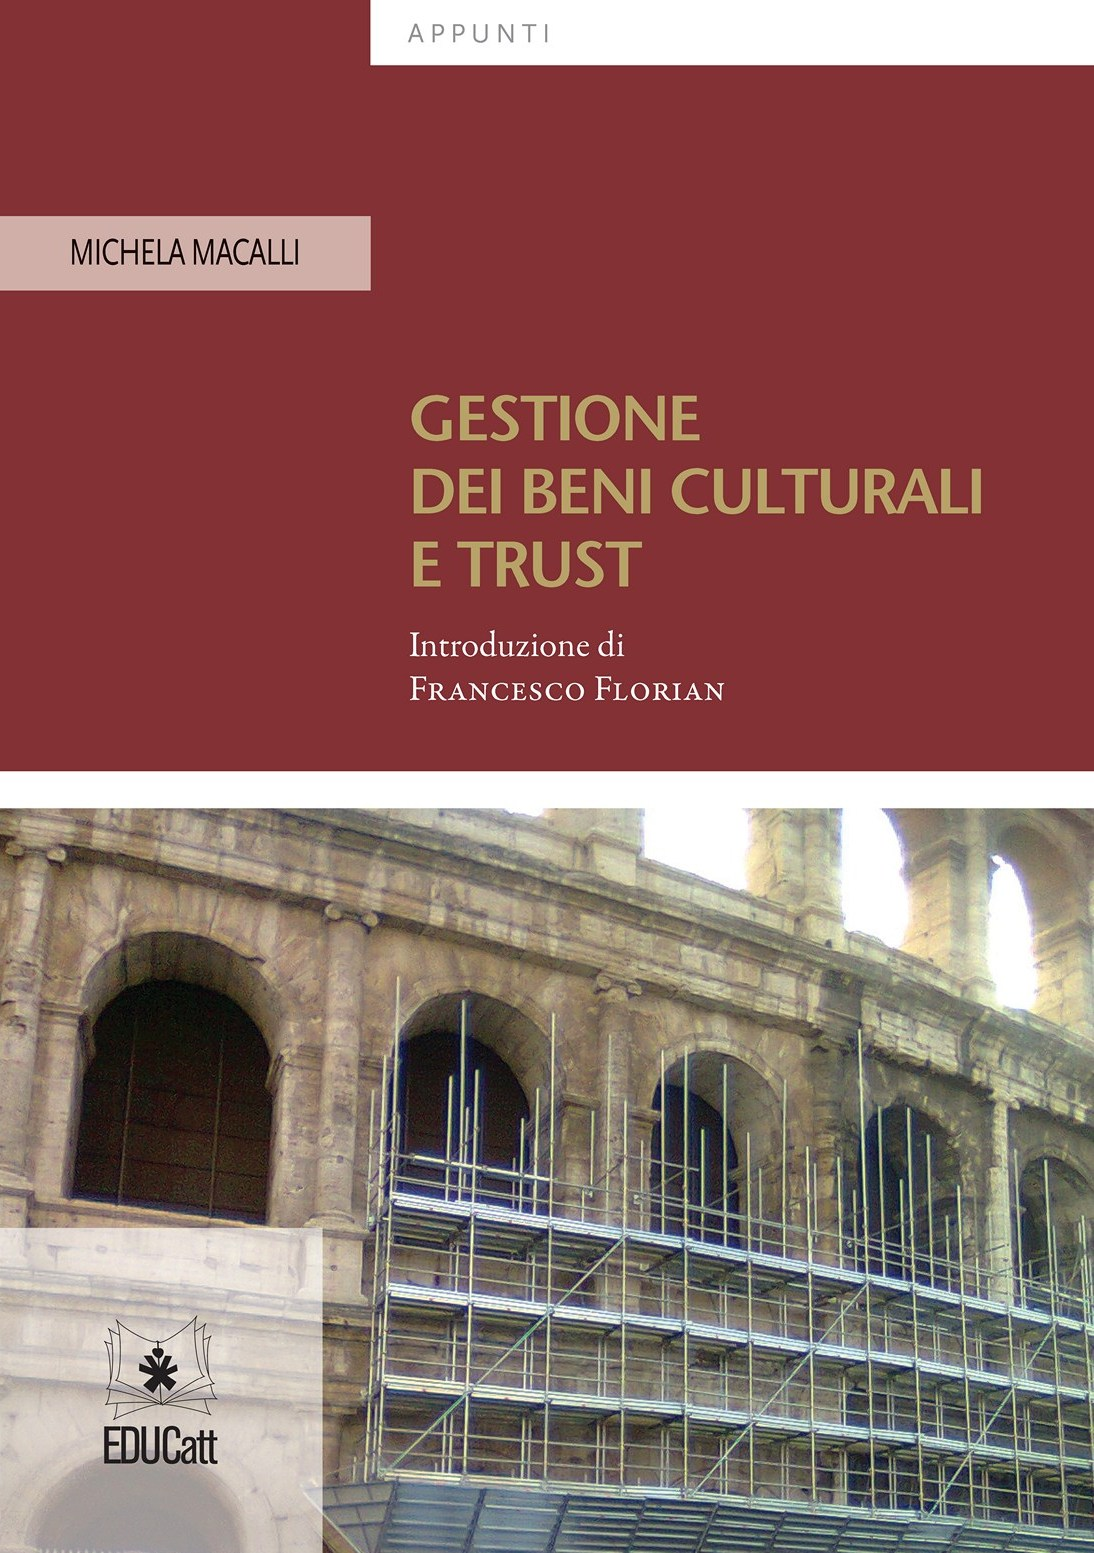 GESTIONE DEI BENI CULTURALI E TRUST